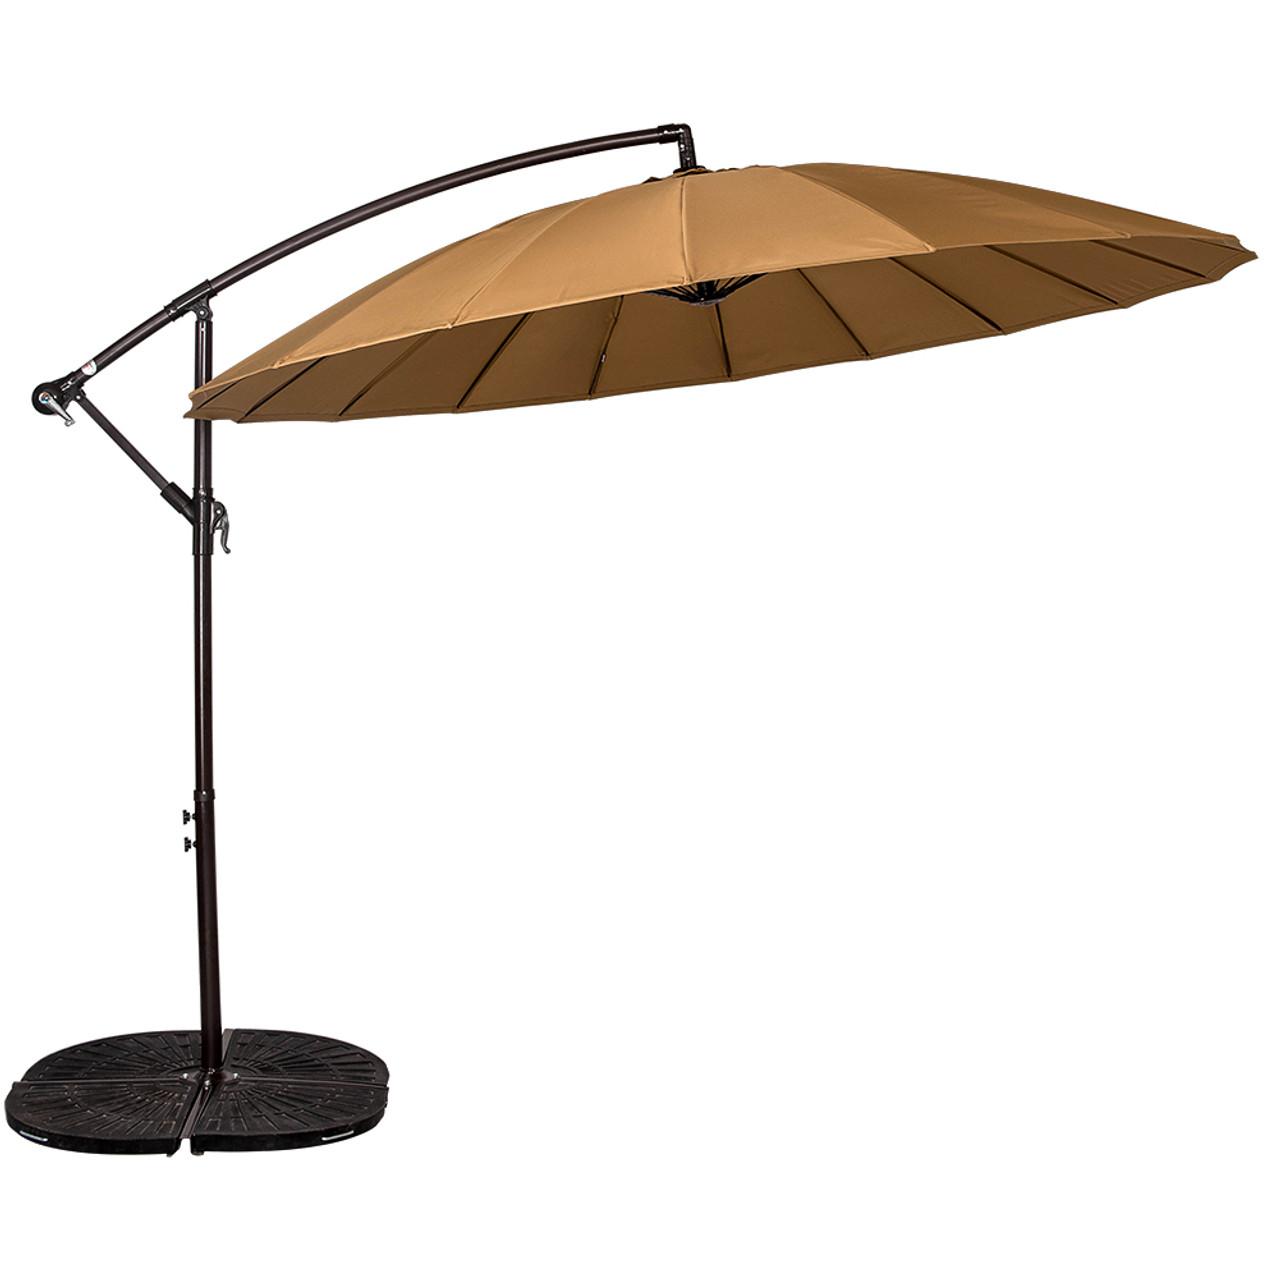 9 Feet Offset Patio Umbrella With Crank, 18 Fiberglass Ribs (Tan) On Sale